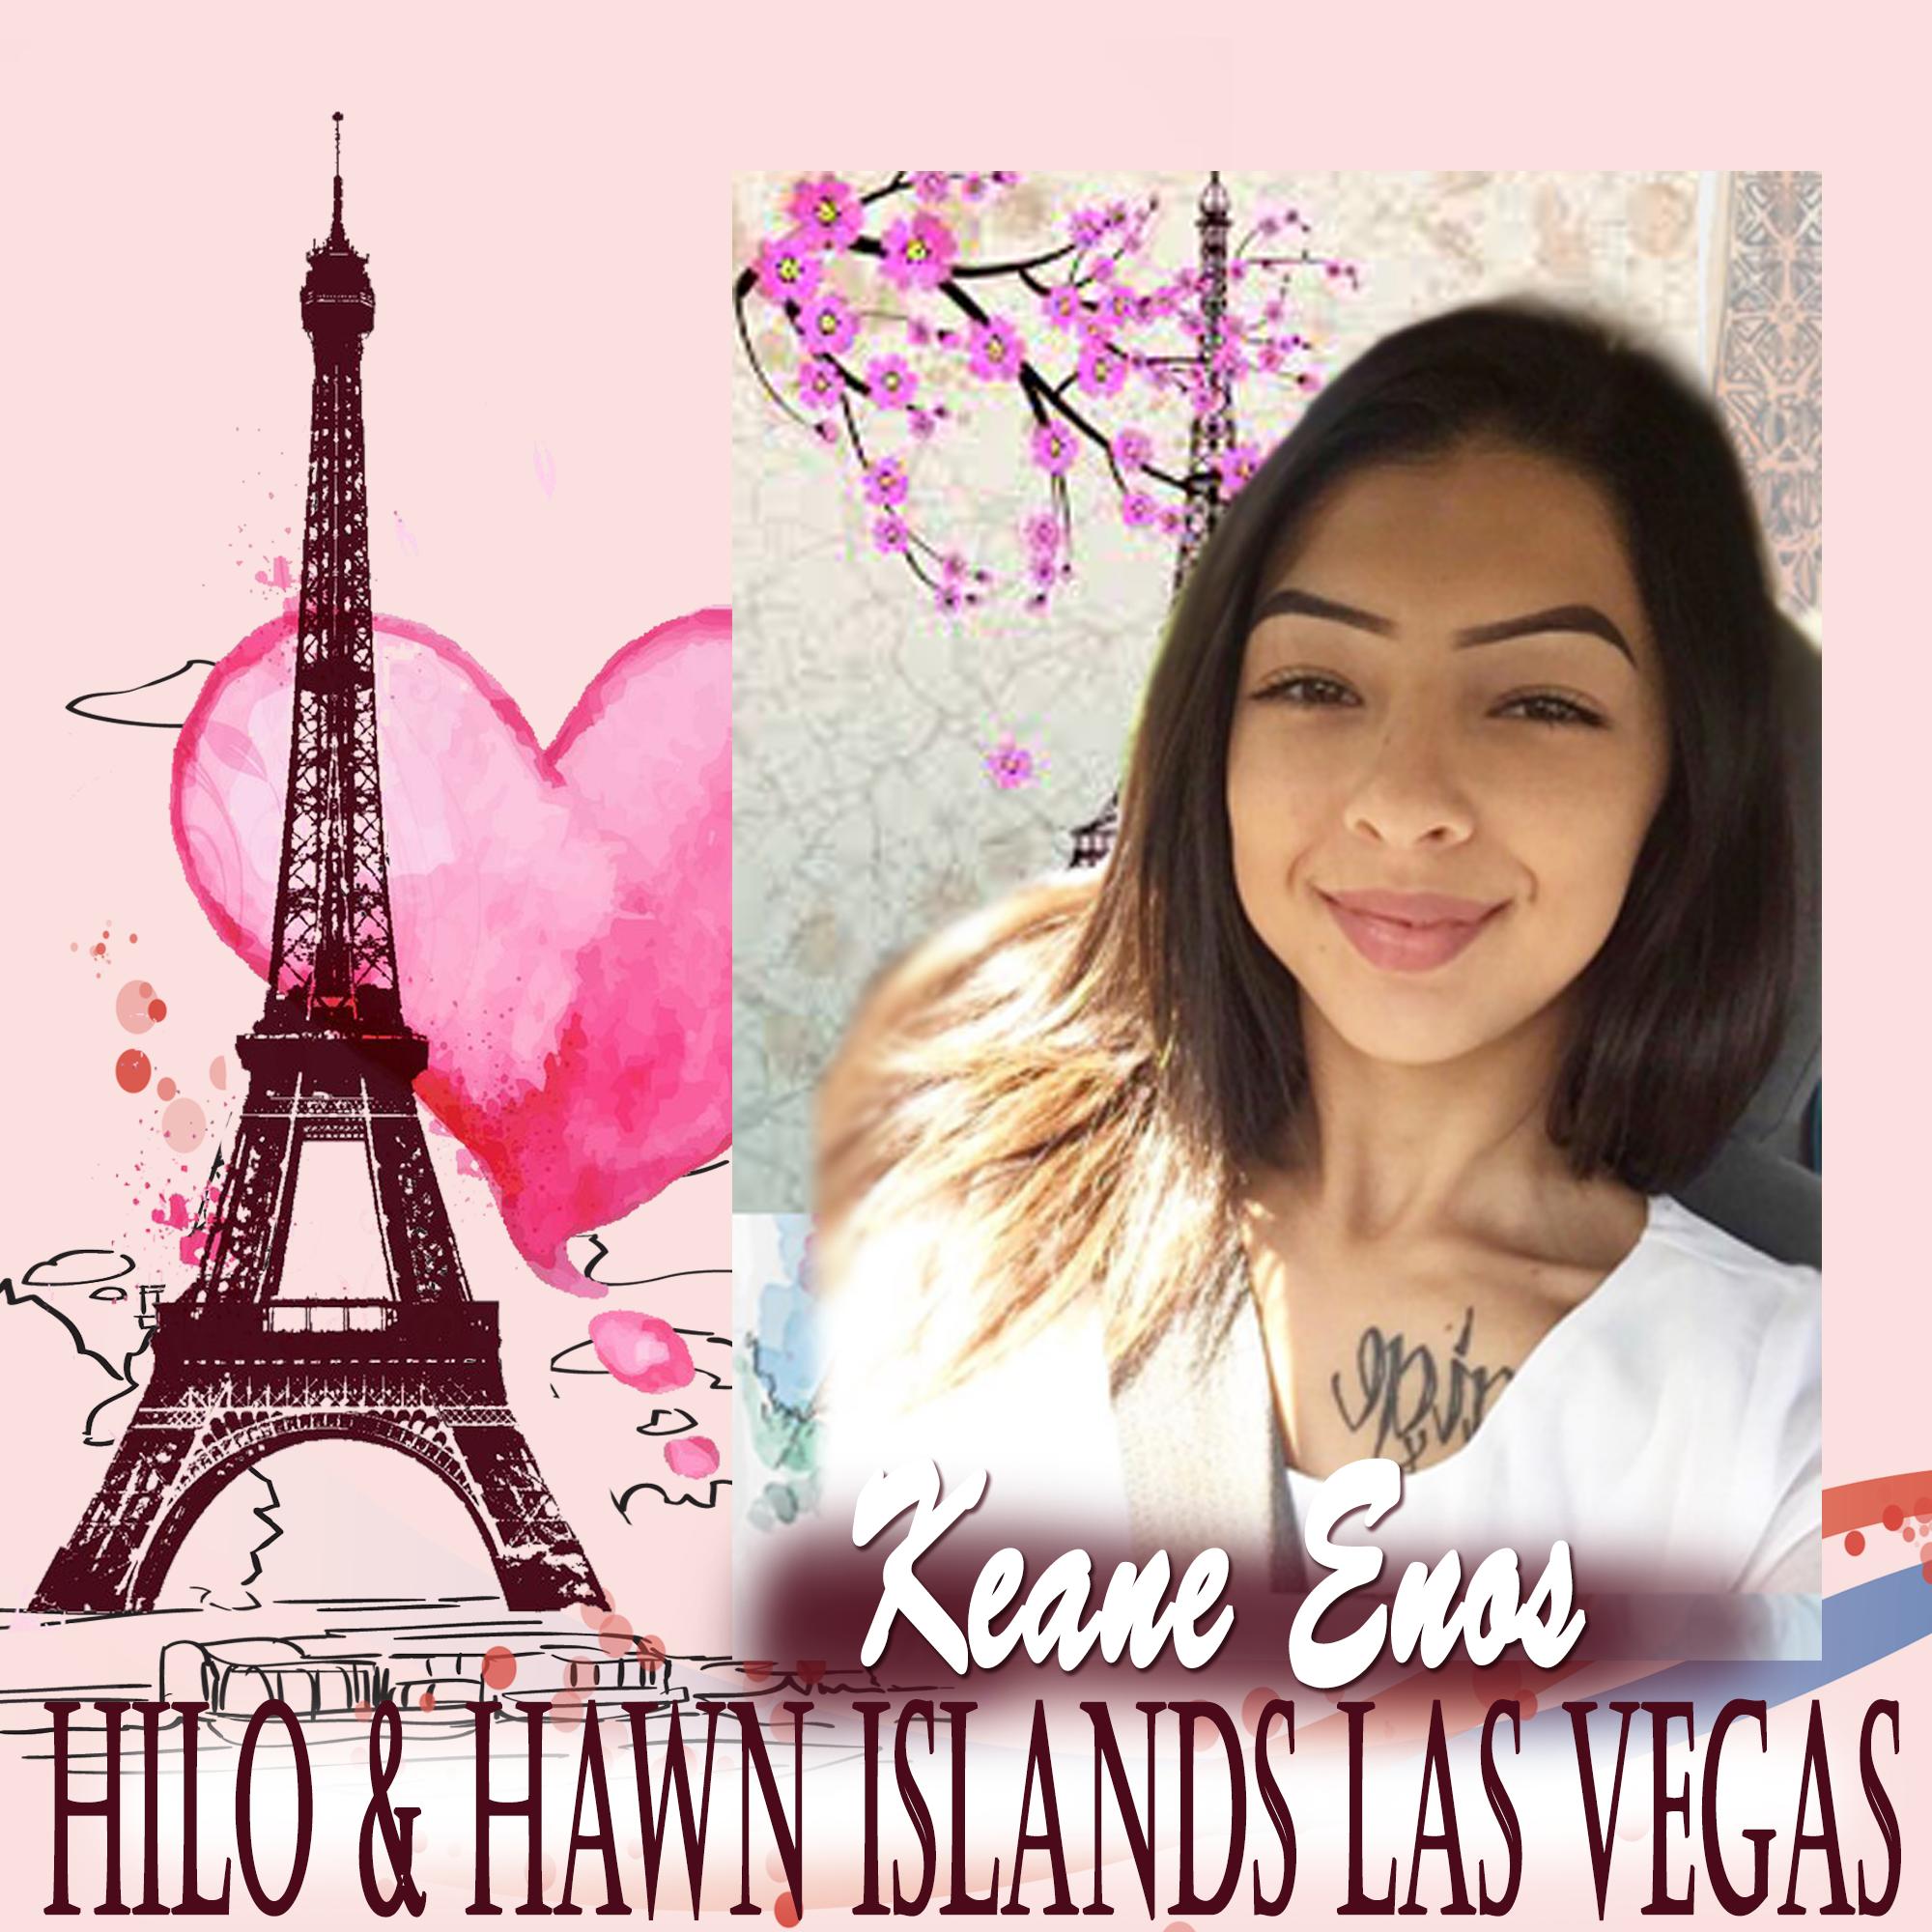 Hilo Hawaii Las Vegas Acti-Labs Ambassador Keane Enos